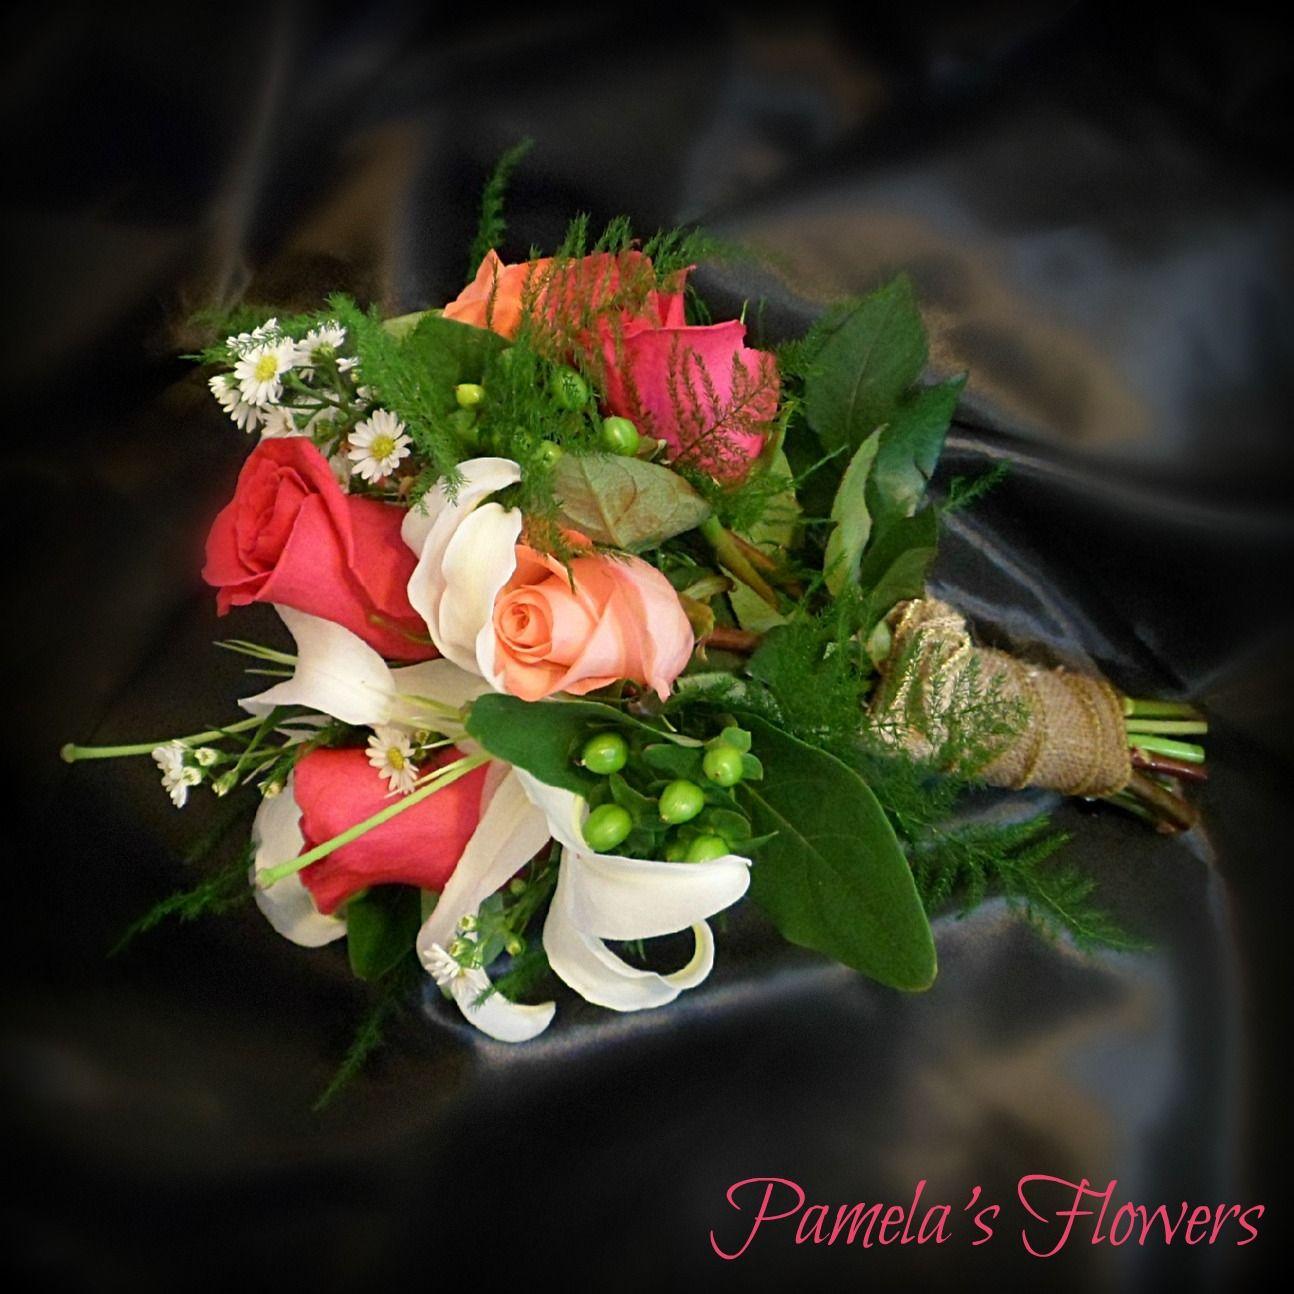 Weddings Pamela S Flowers Enola Pa 17025 Bouquet Design Wedding Flowers Afternoon Tea Wedding